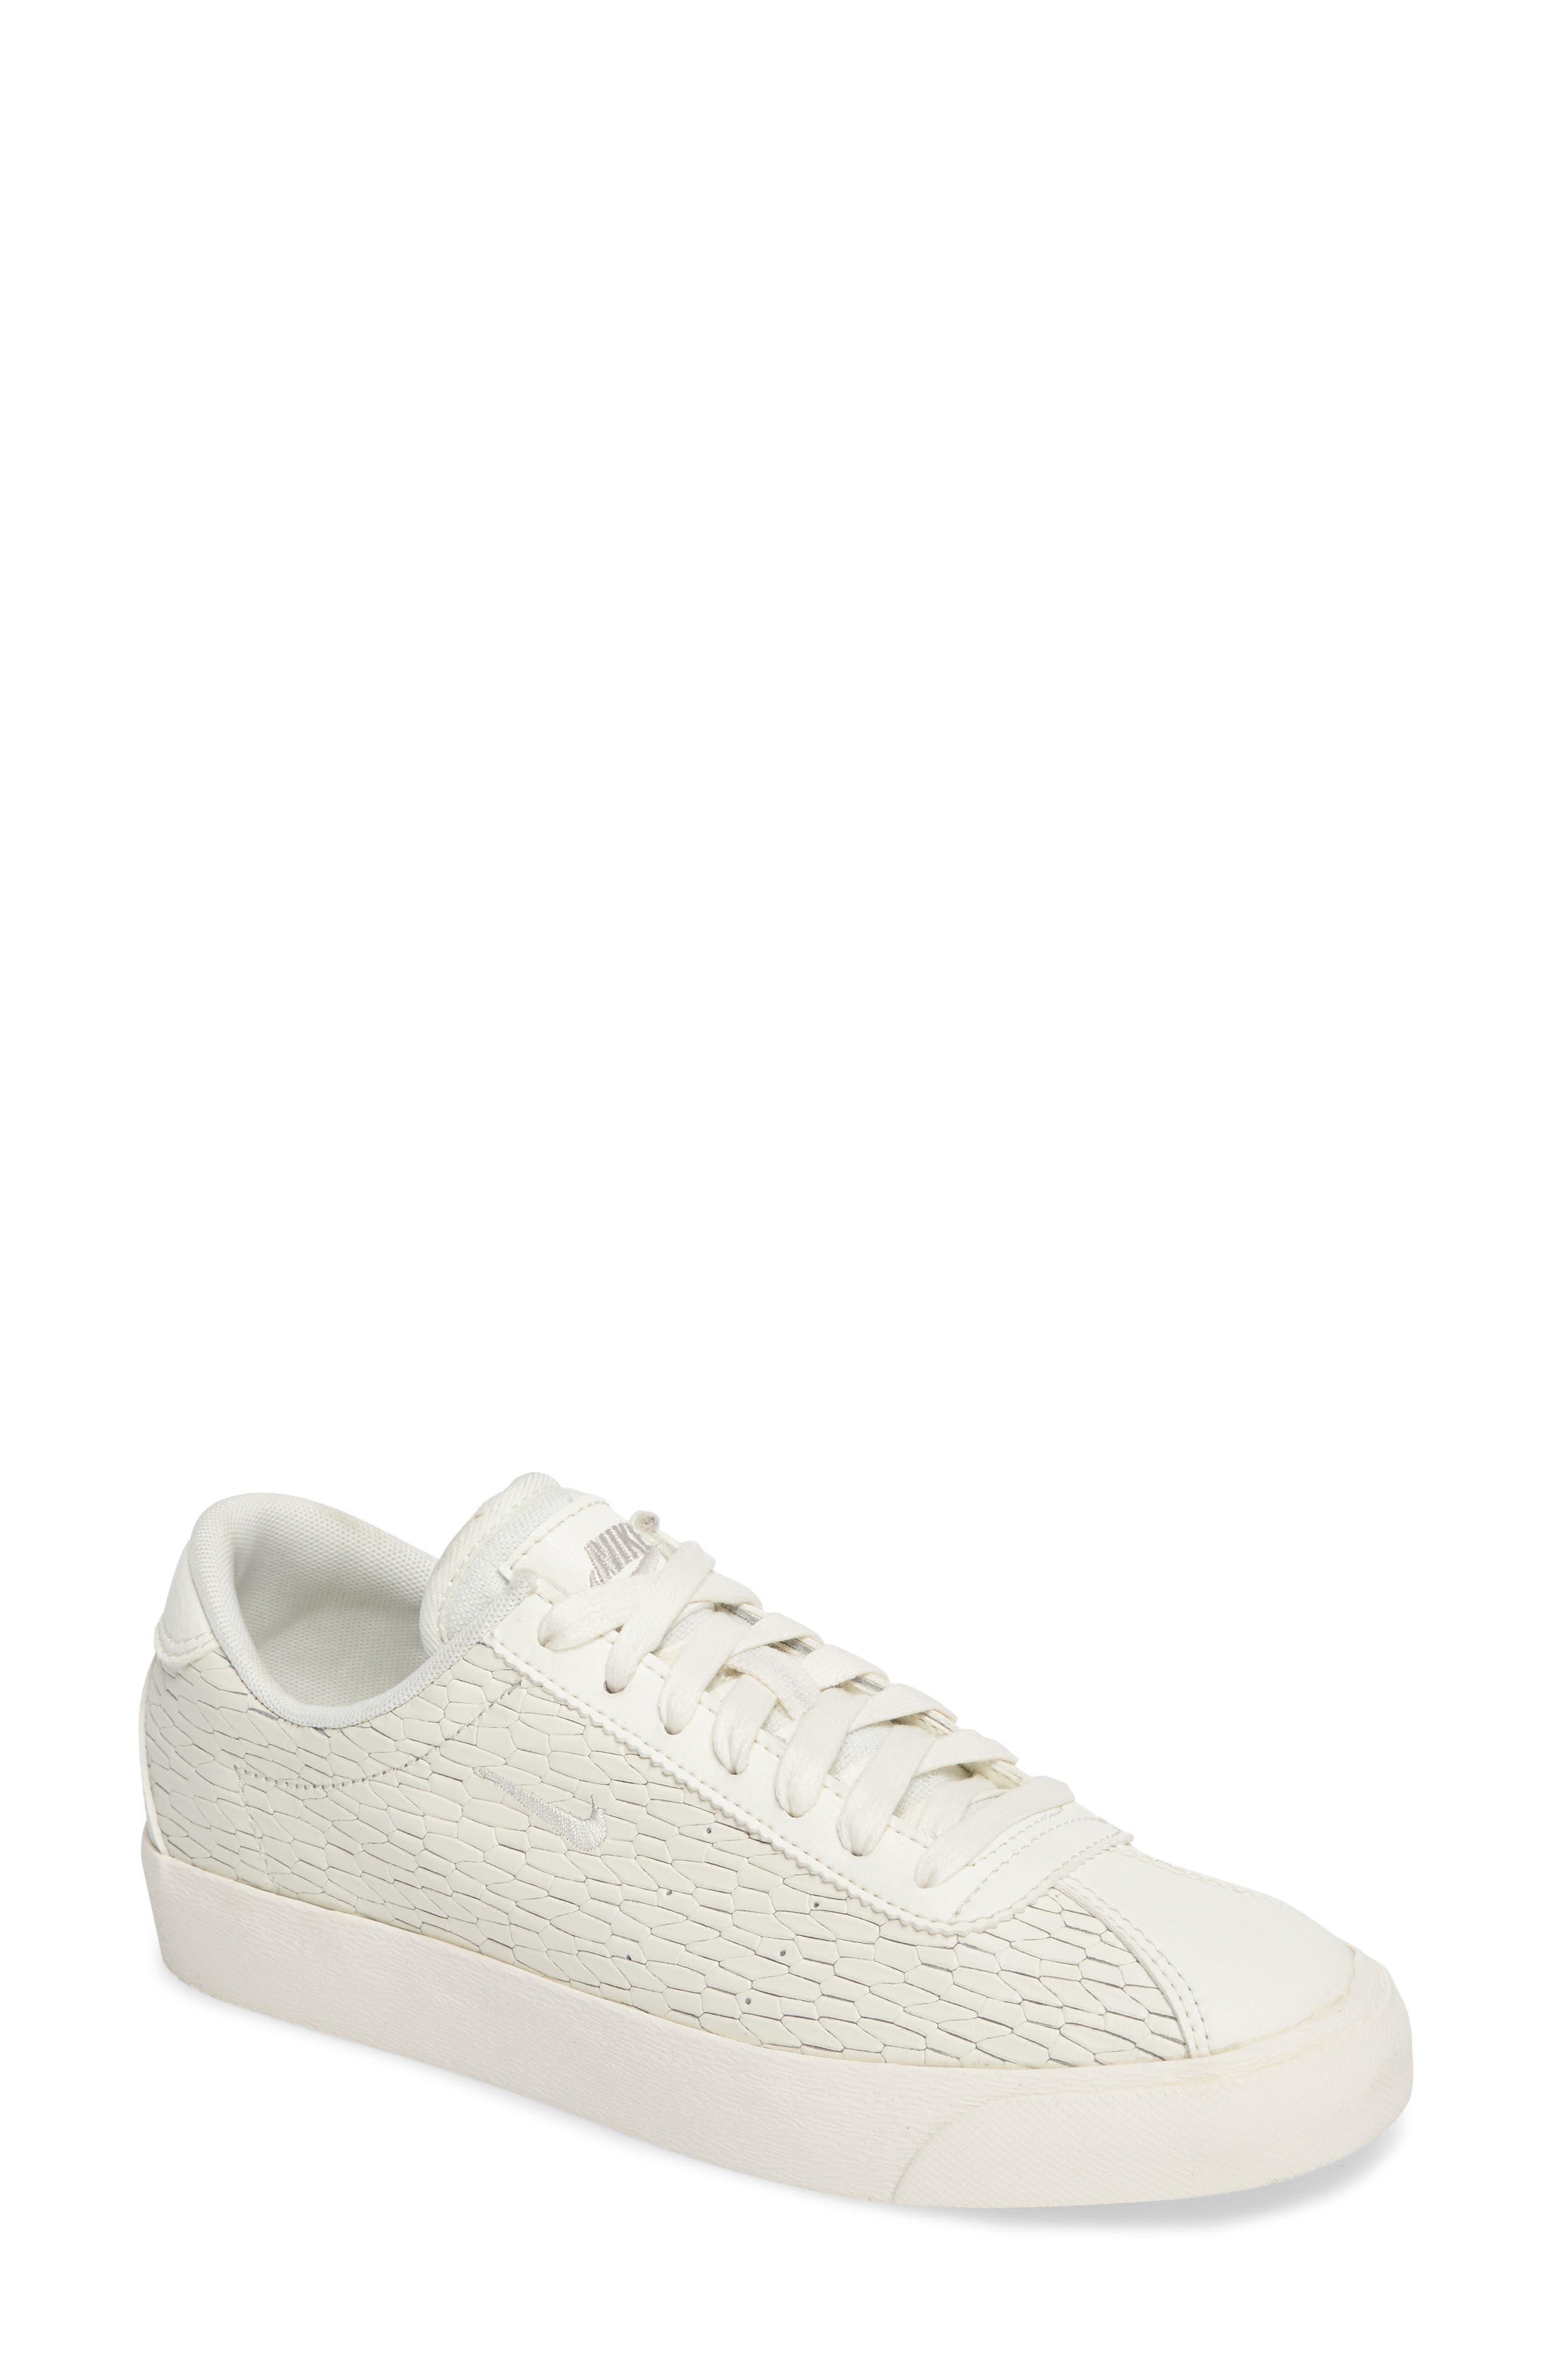 Match Classic Sneaker,                         Main,                         color, Sail/ Light Bone/ White